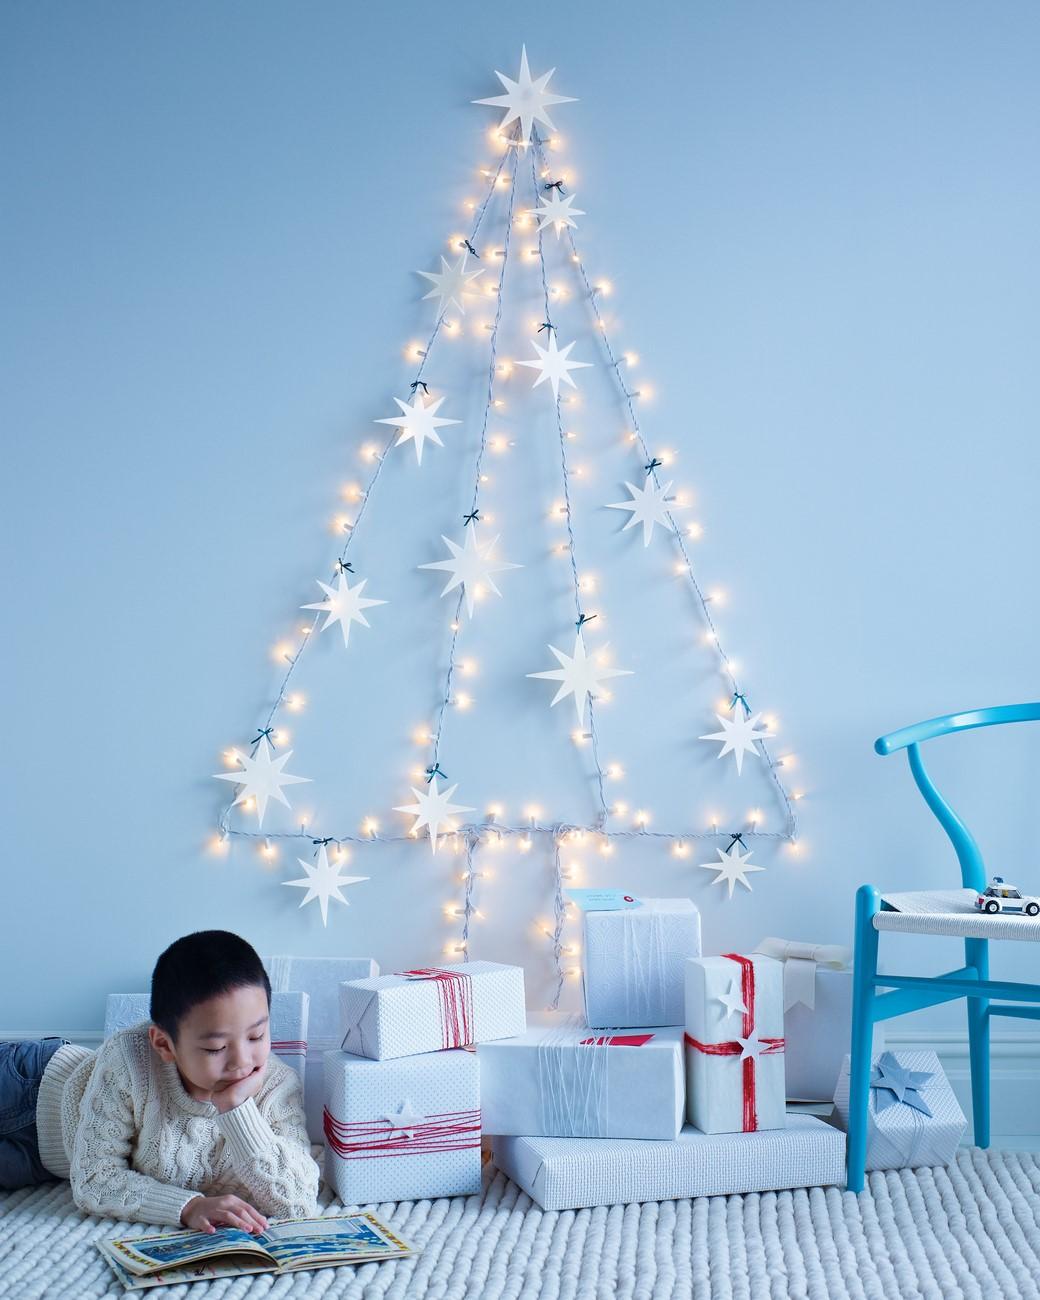 Bel arbre de Noël que vos enfants vont adorer.